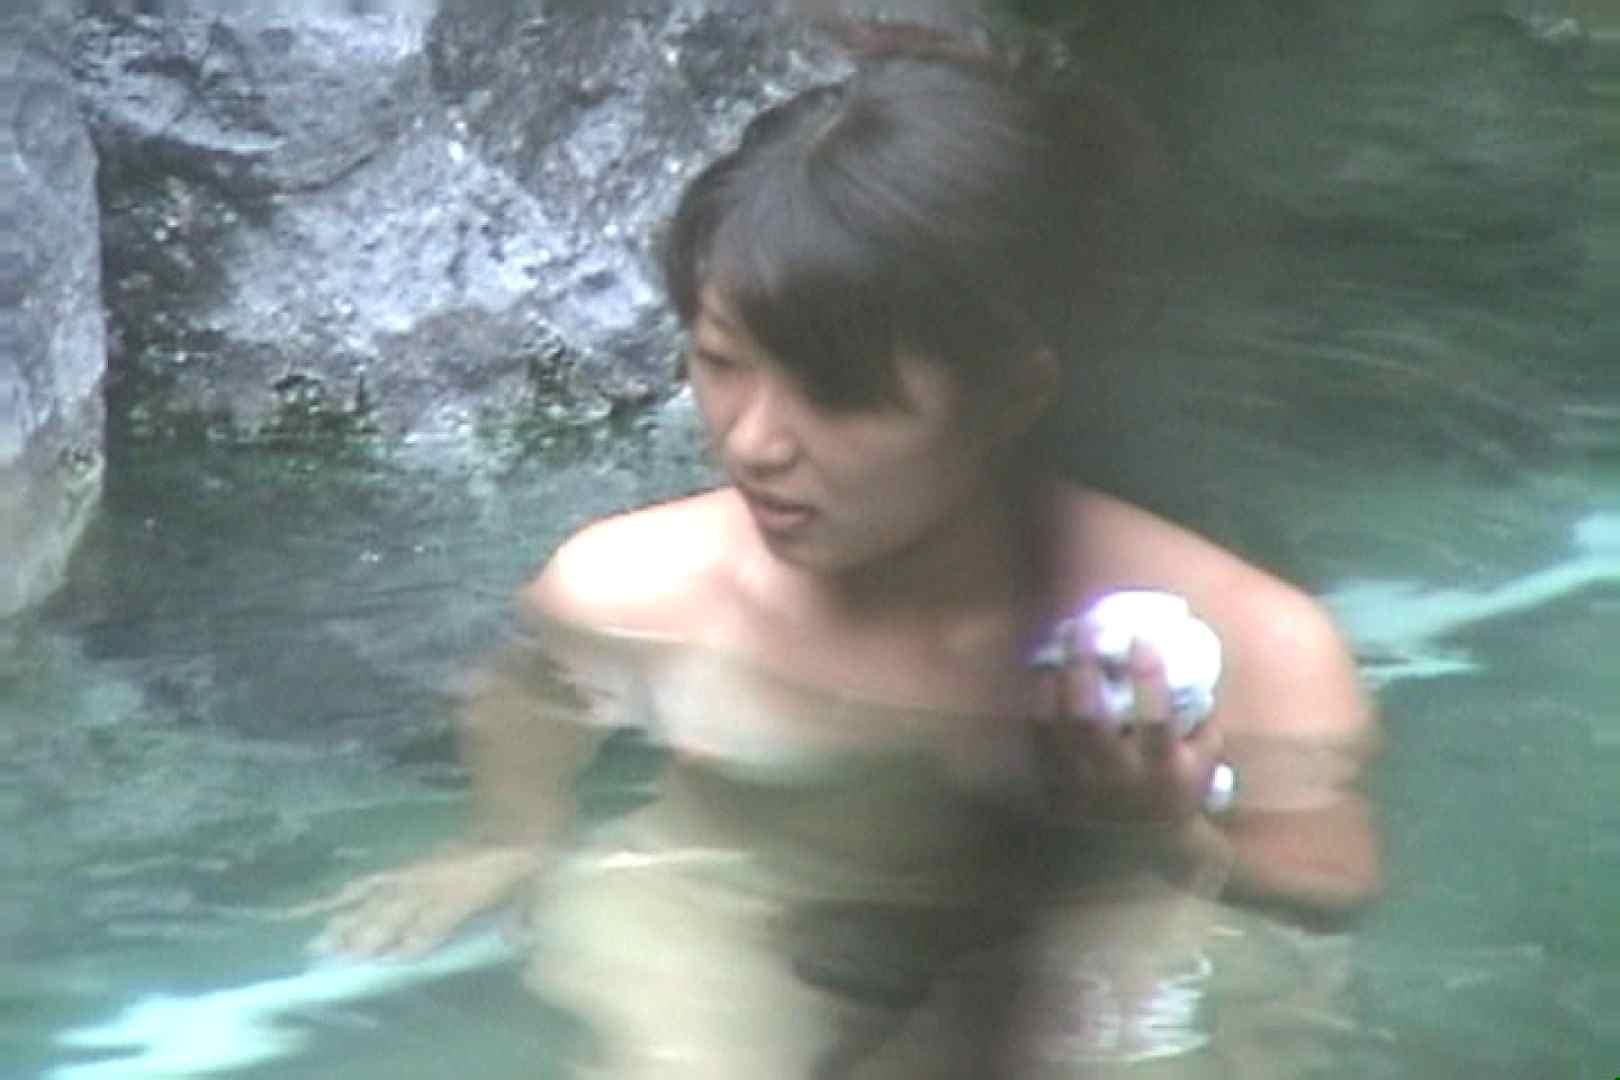 Aquaな露天風呂Vol.69【VIP限定】 OLのエロ生活   露天風呂  106連発 16